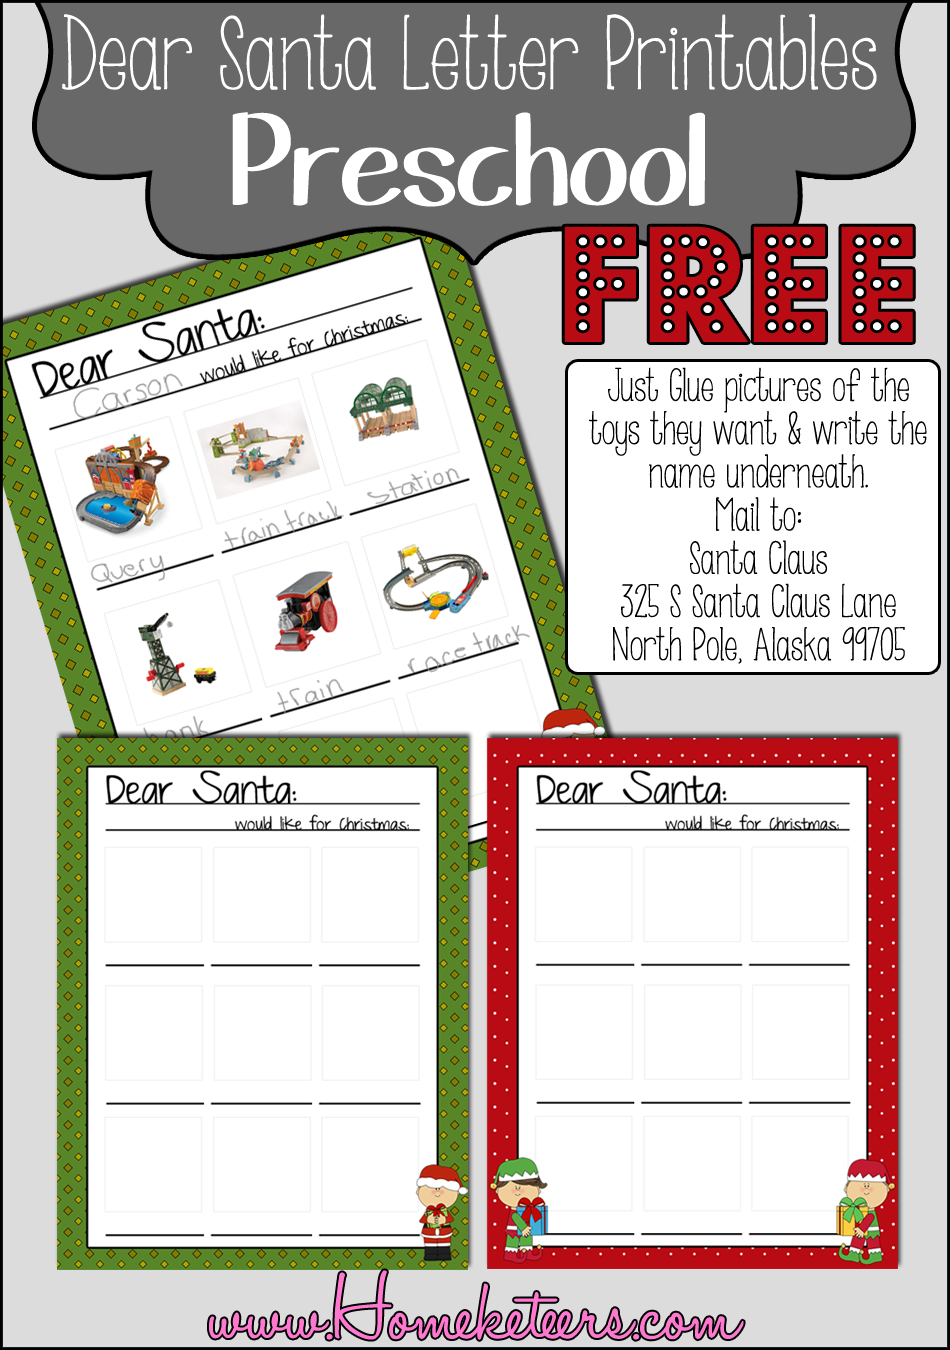 Dear Santa Letters  Free Printables  Dear Santa Free Printables